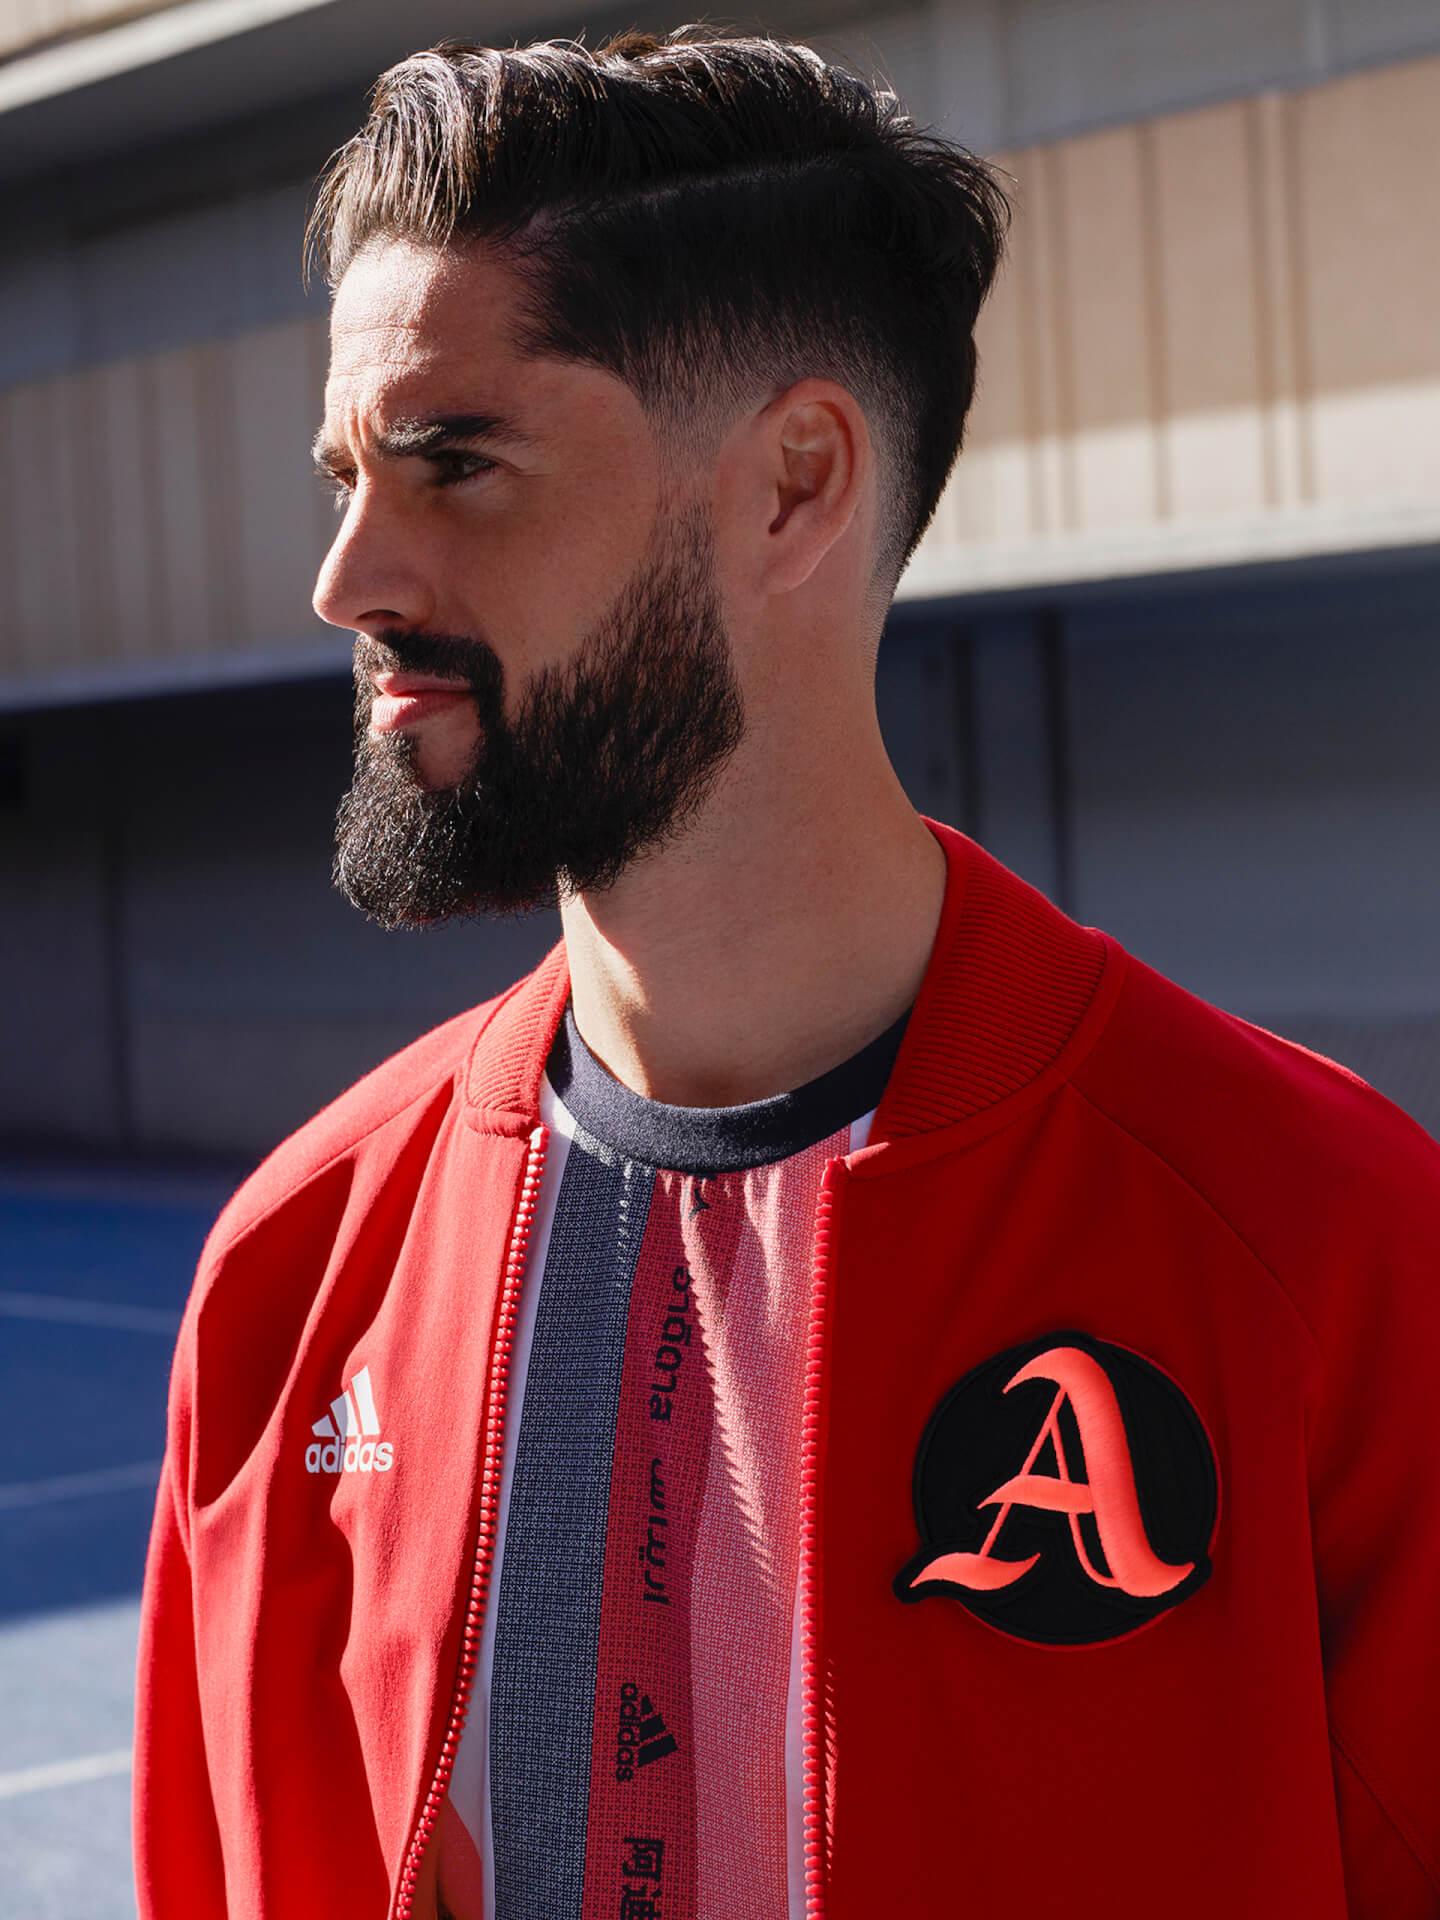 「adidas Athletics」SS20コレクションが発売!キャンペーンビジュアルを務めるコムアイのイメージフィルム本日公開 lf200206_addidasathletics_18